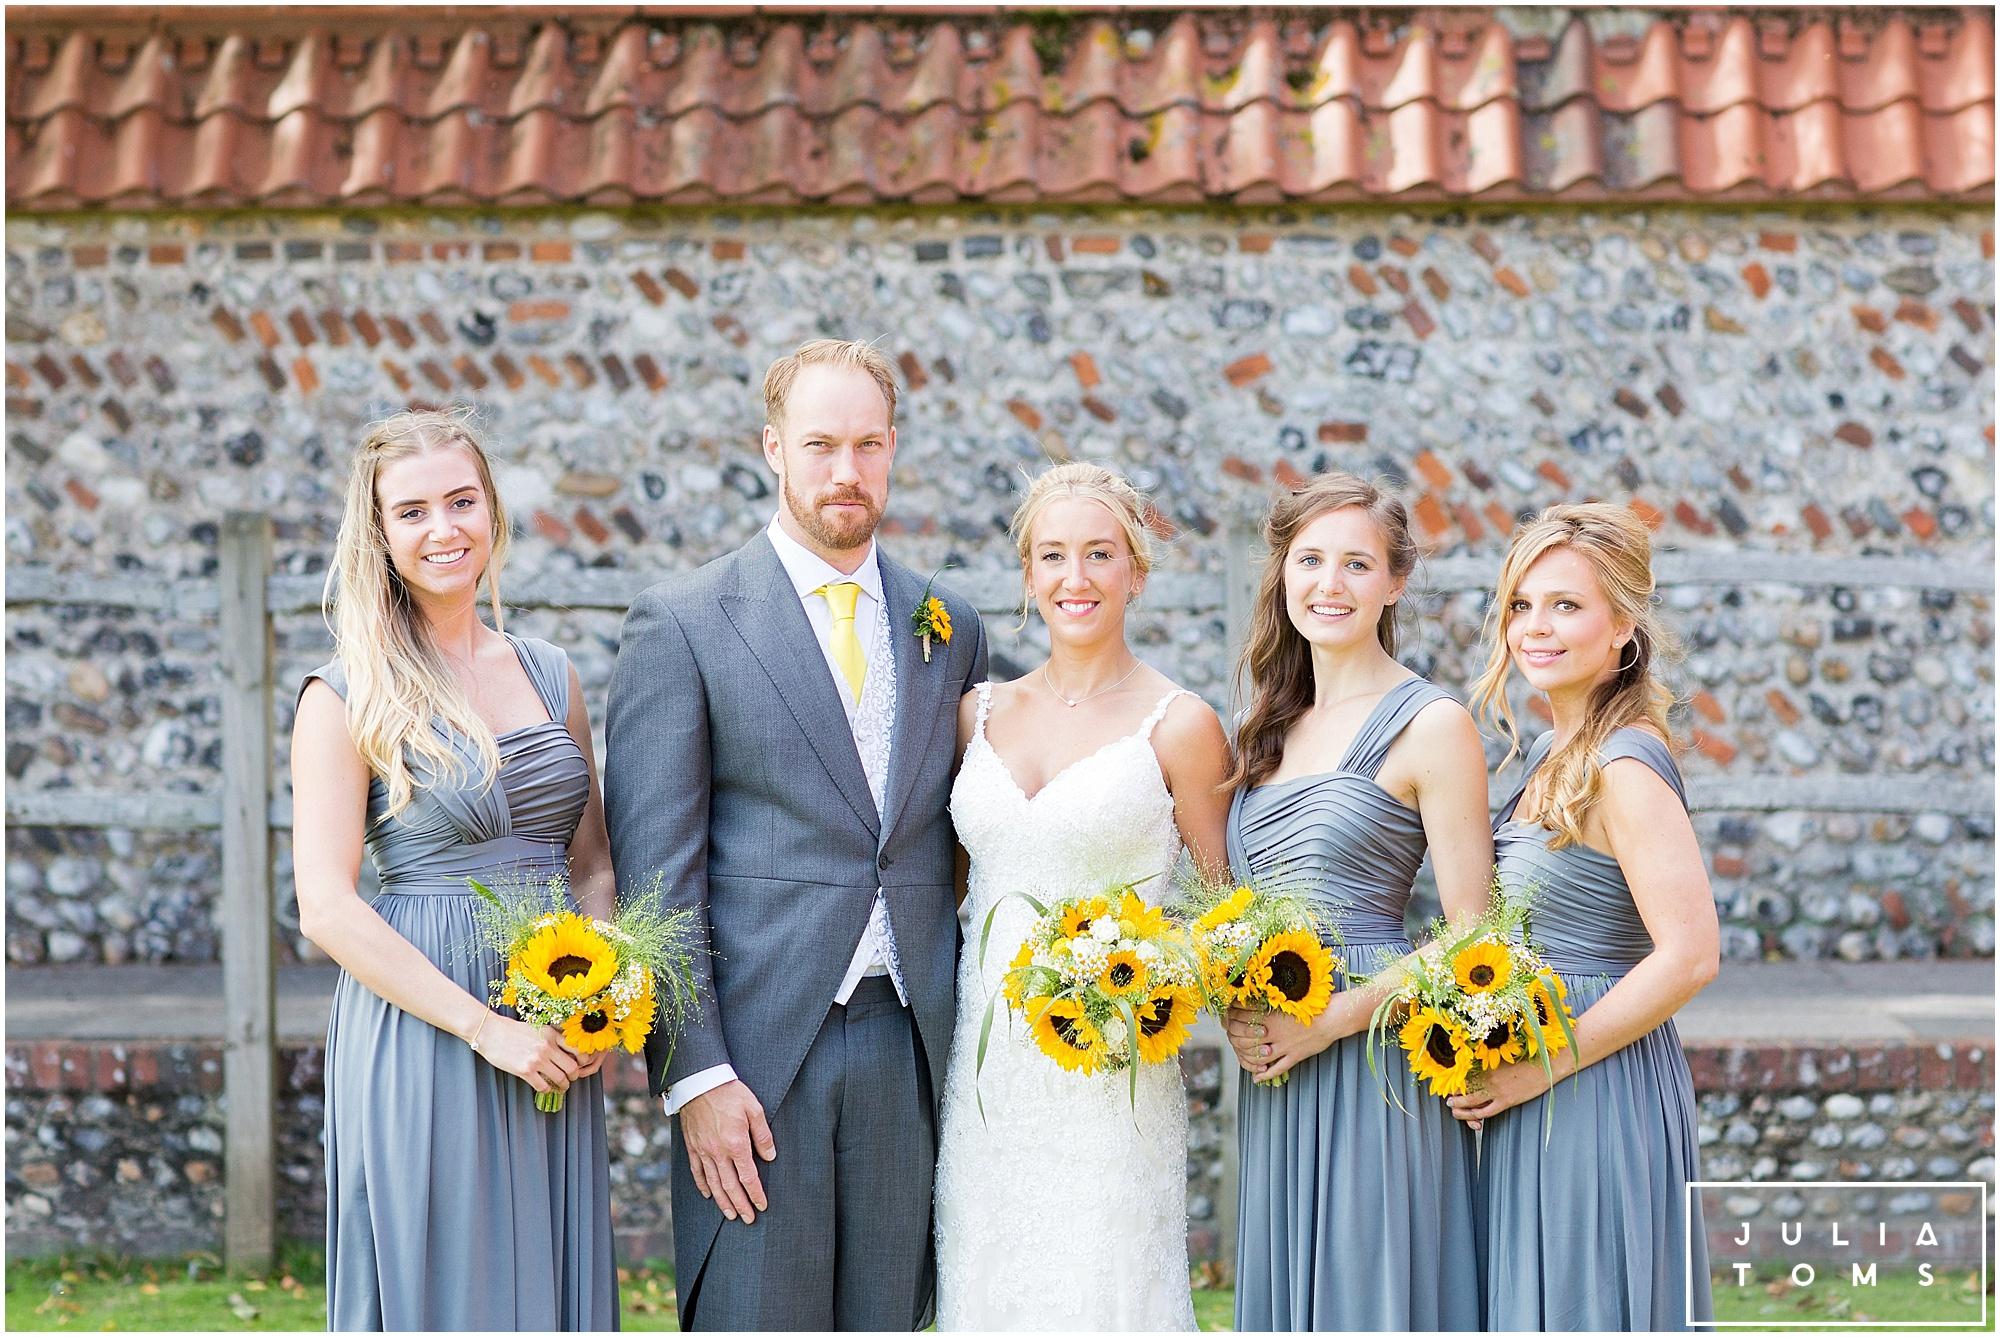 julia_toms_chichester_wedding_photographer_worthing_059.jpg